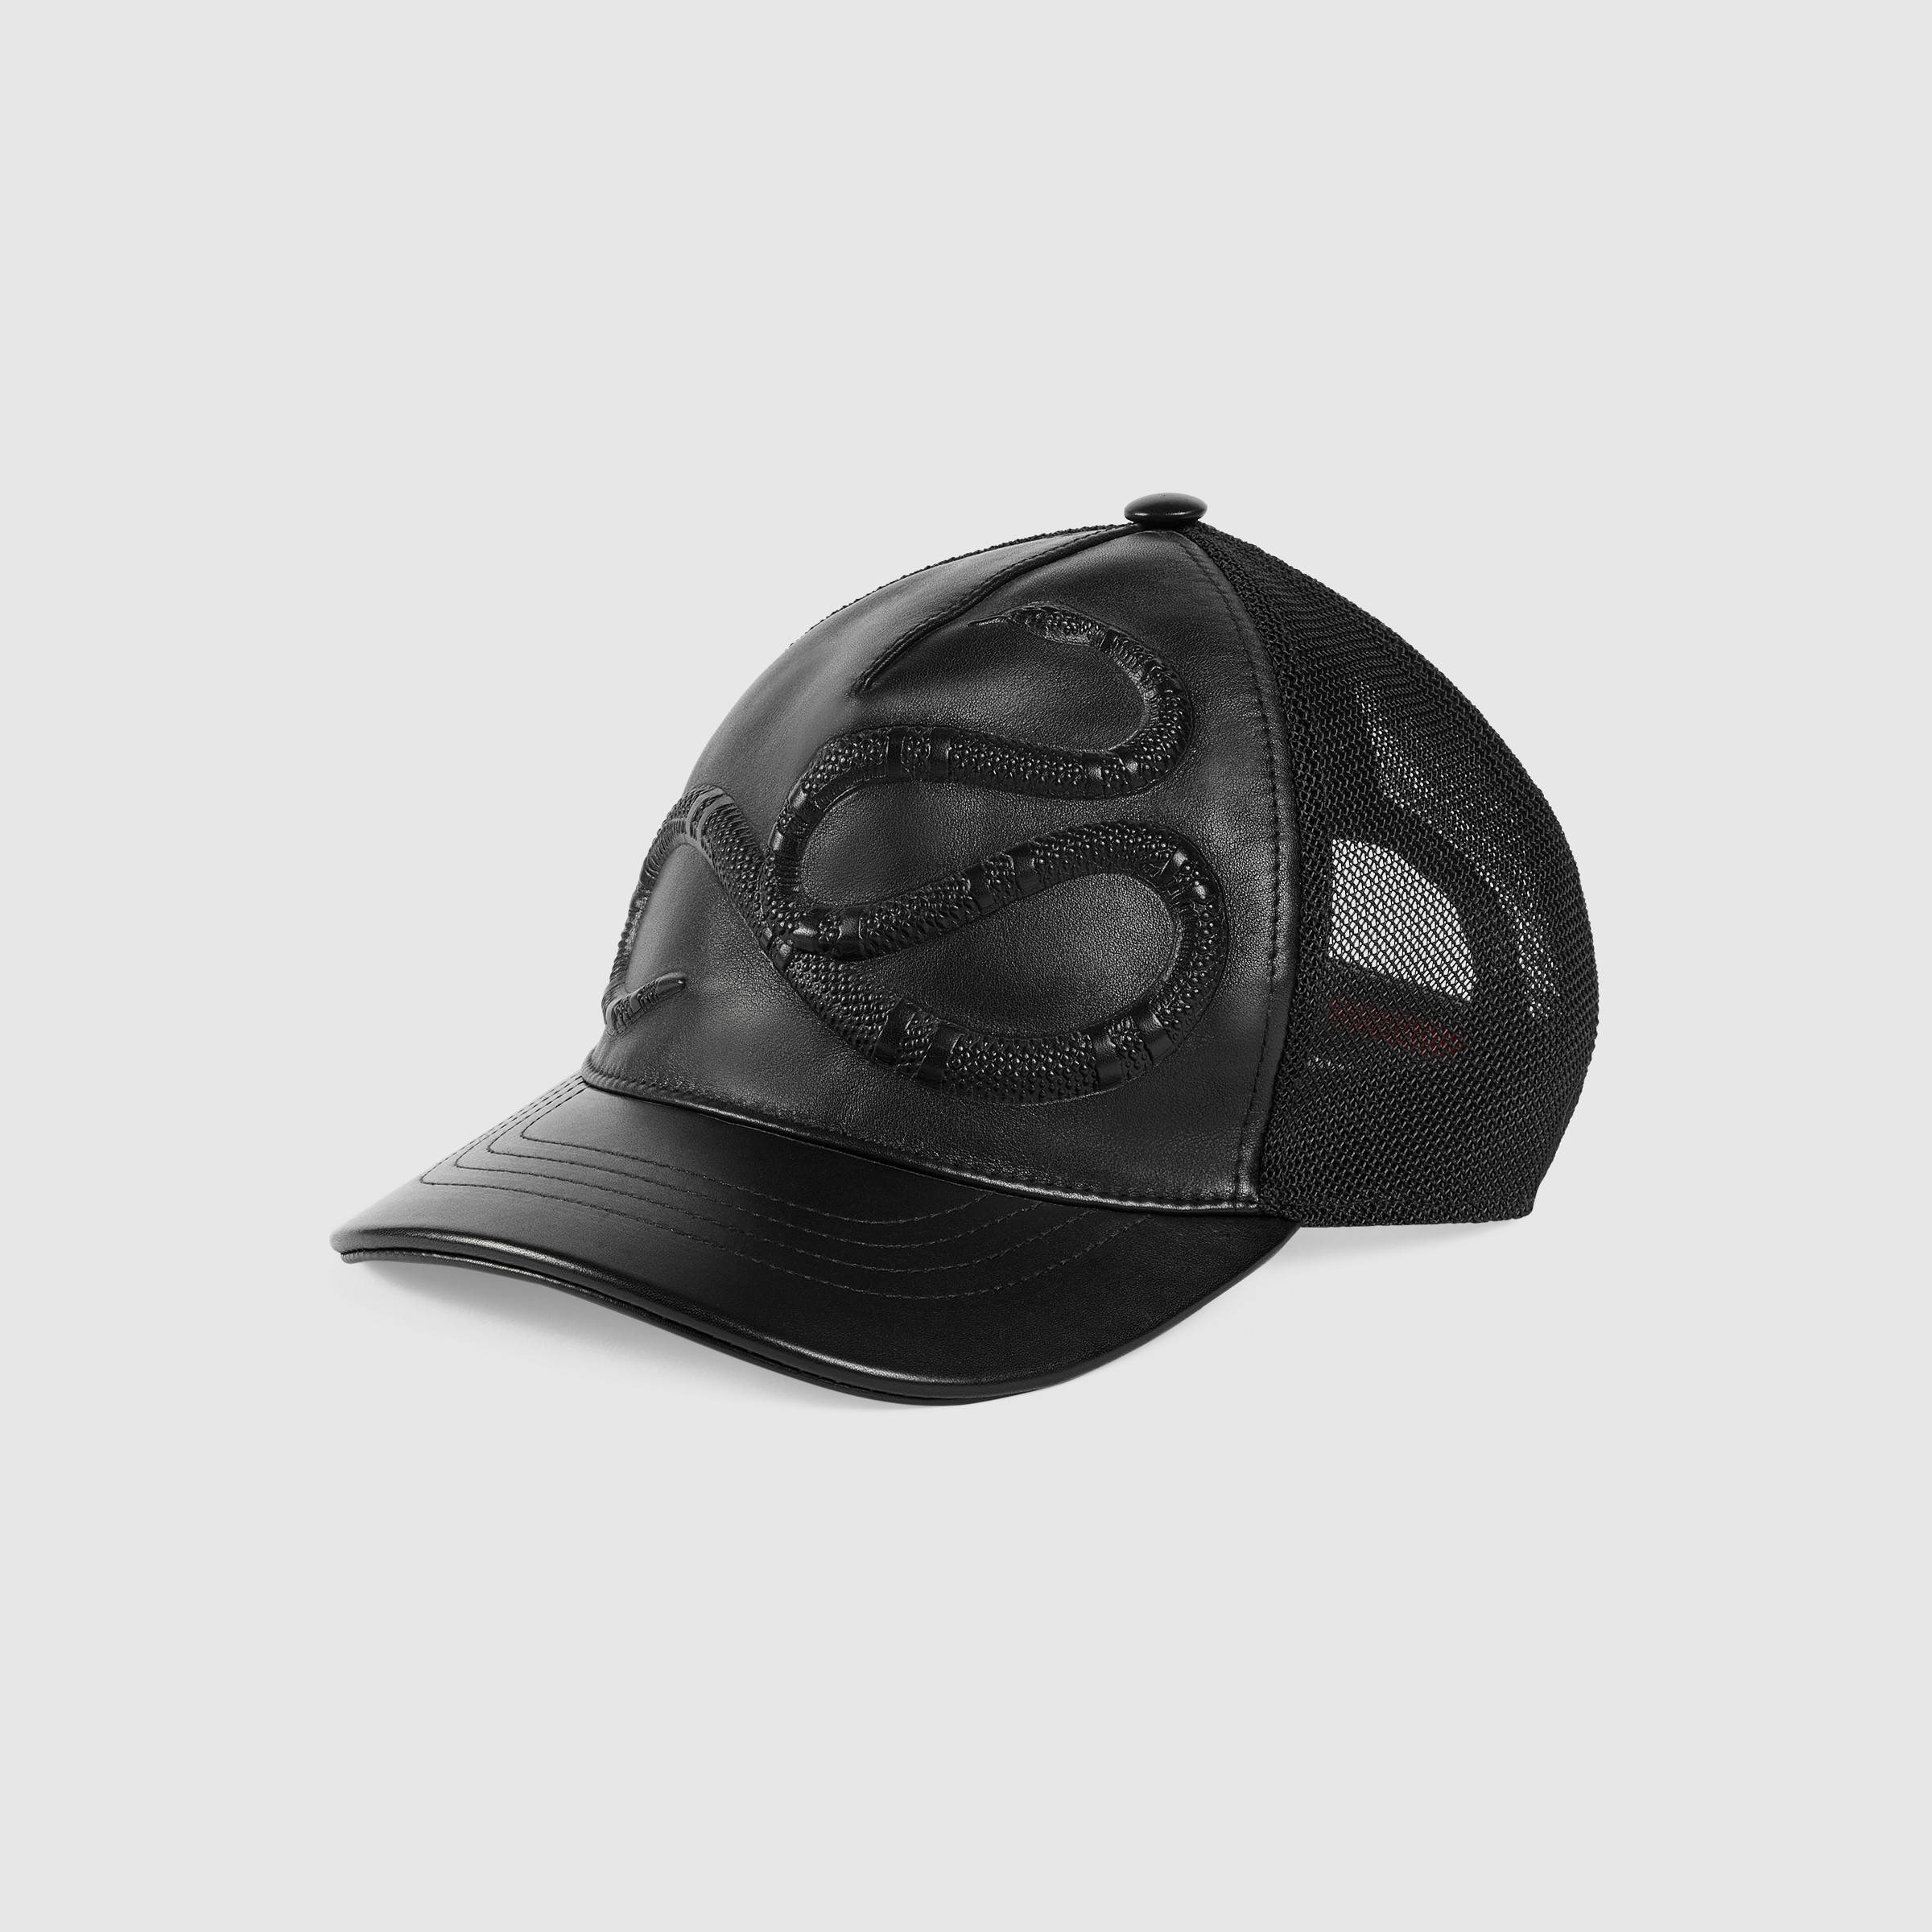 mens baseball style hats photo - 1